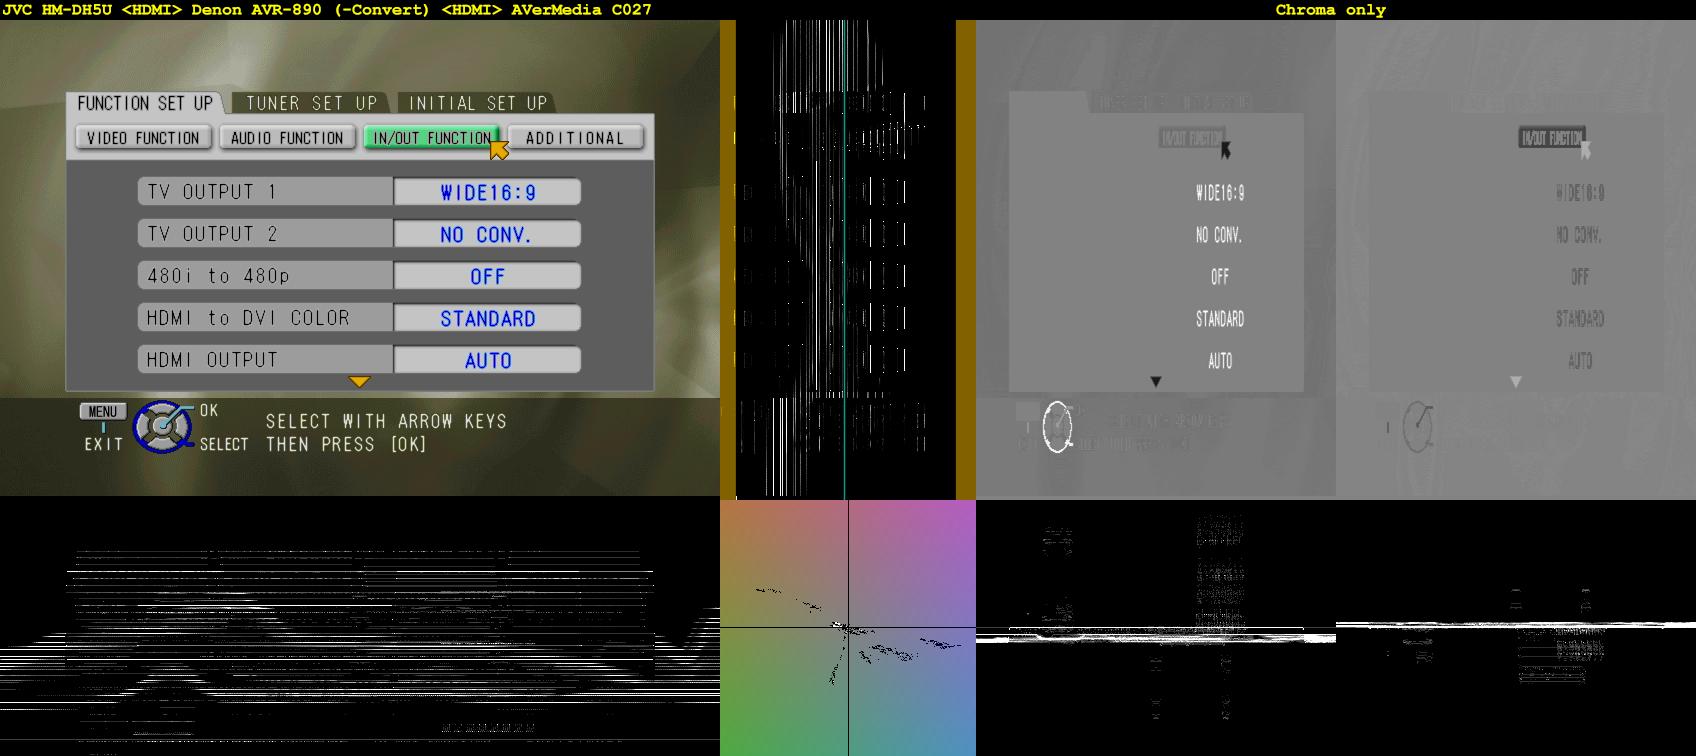 Click image for larger version  Name:Menu - JVC HM-DH5U =HDMI= Denon AVR-890, -Convert =HDMI= AVerMedia C027.png Views:3063 Size:395.6 KB ID:35275